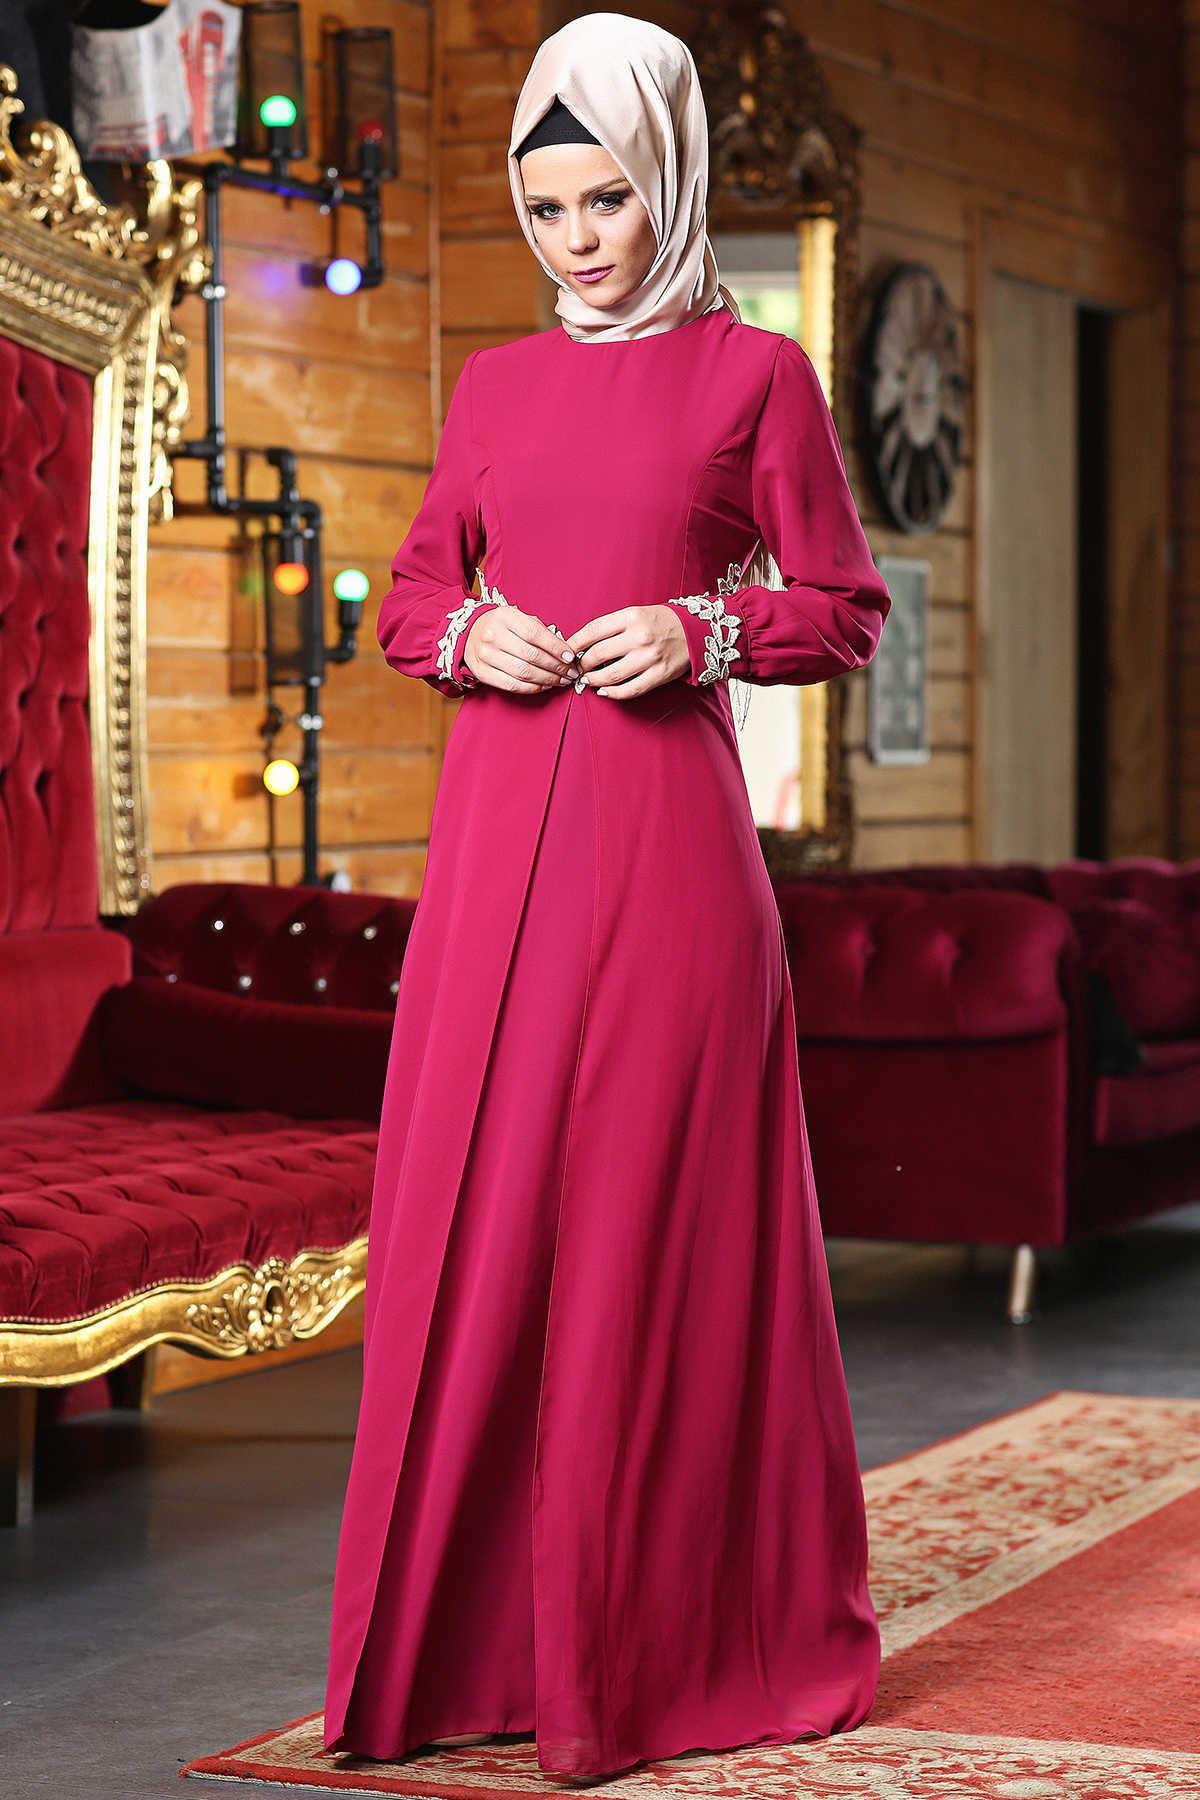 Partirti.com 1 TL Elbise 3 - Patırtı 1 TL  Kampanyası